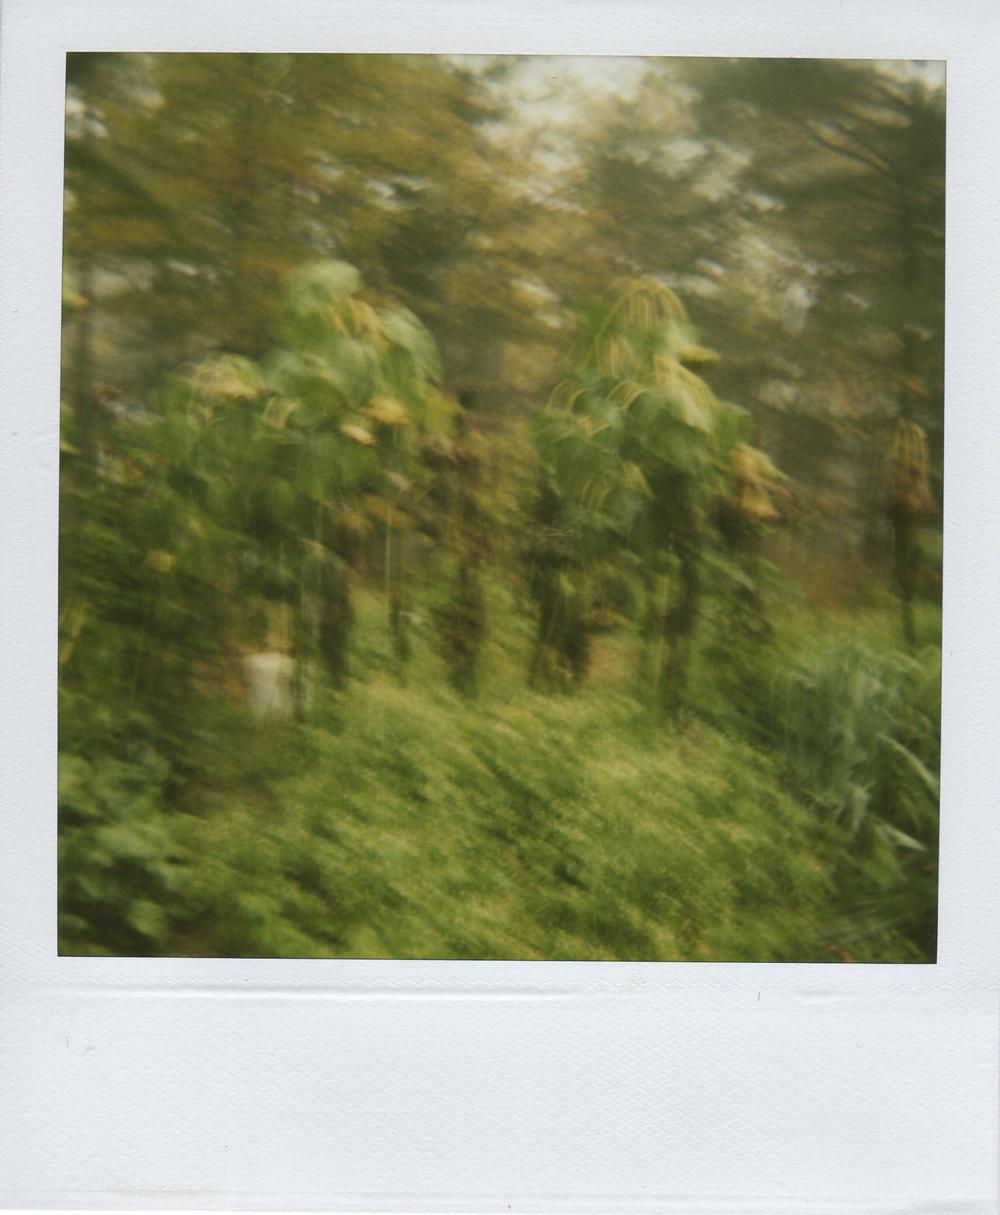 jlaurence-polaroid-035.jpg